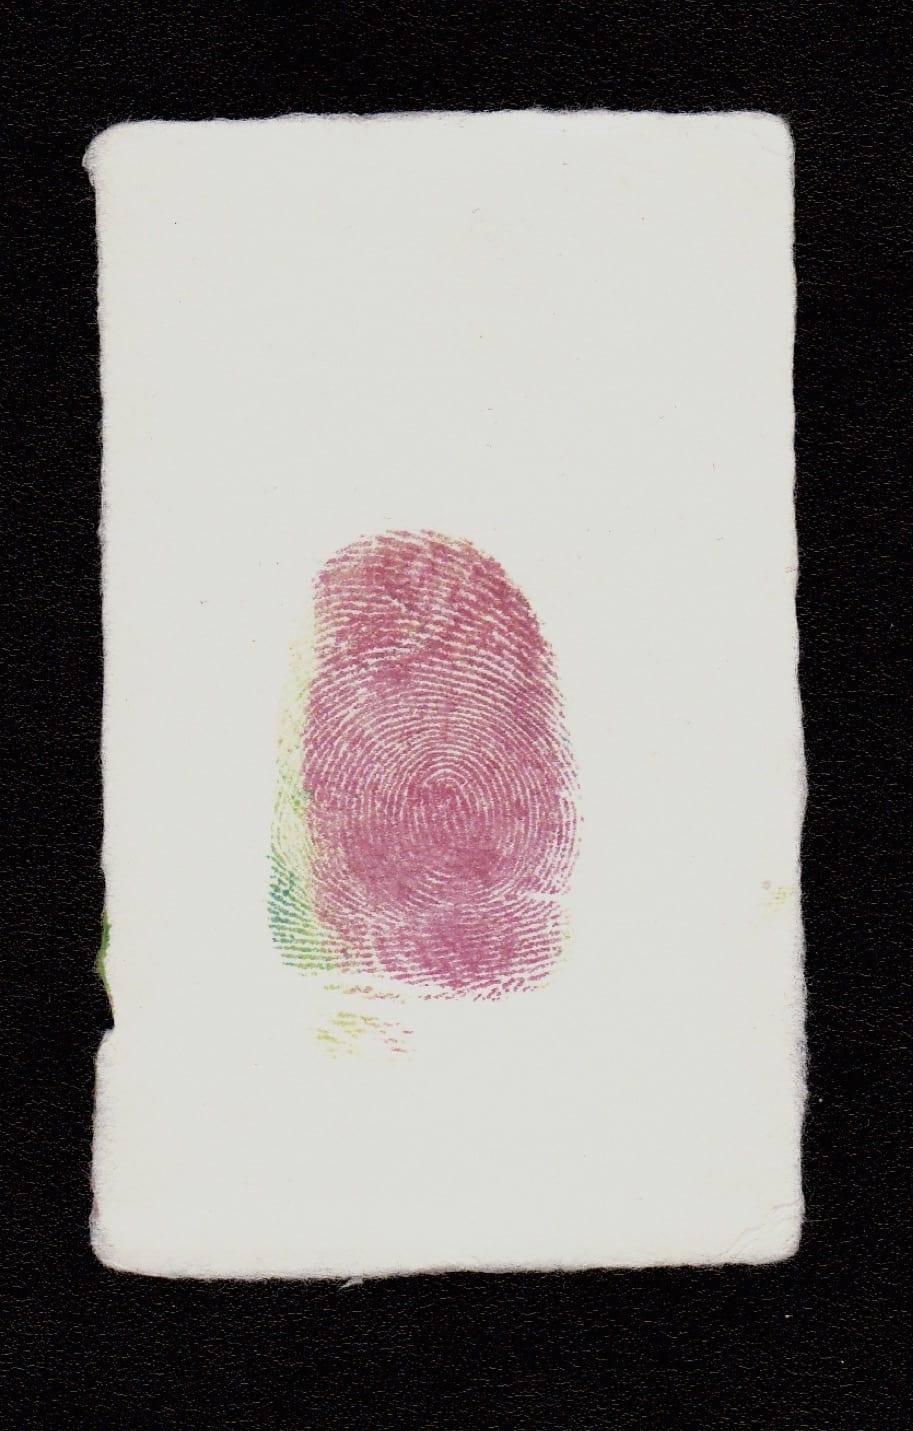 David HAMMONS, Untitled, 2008